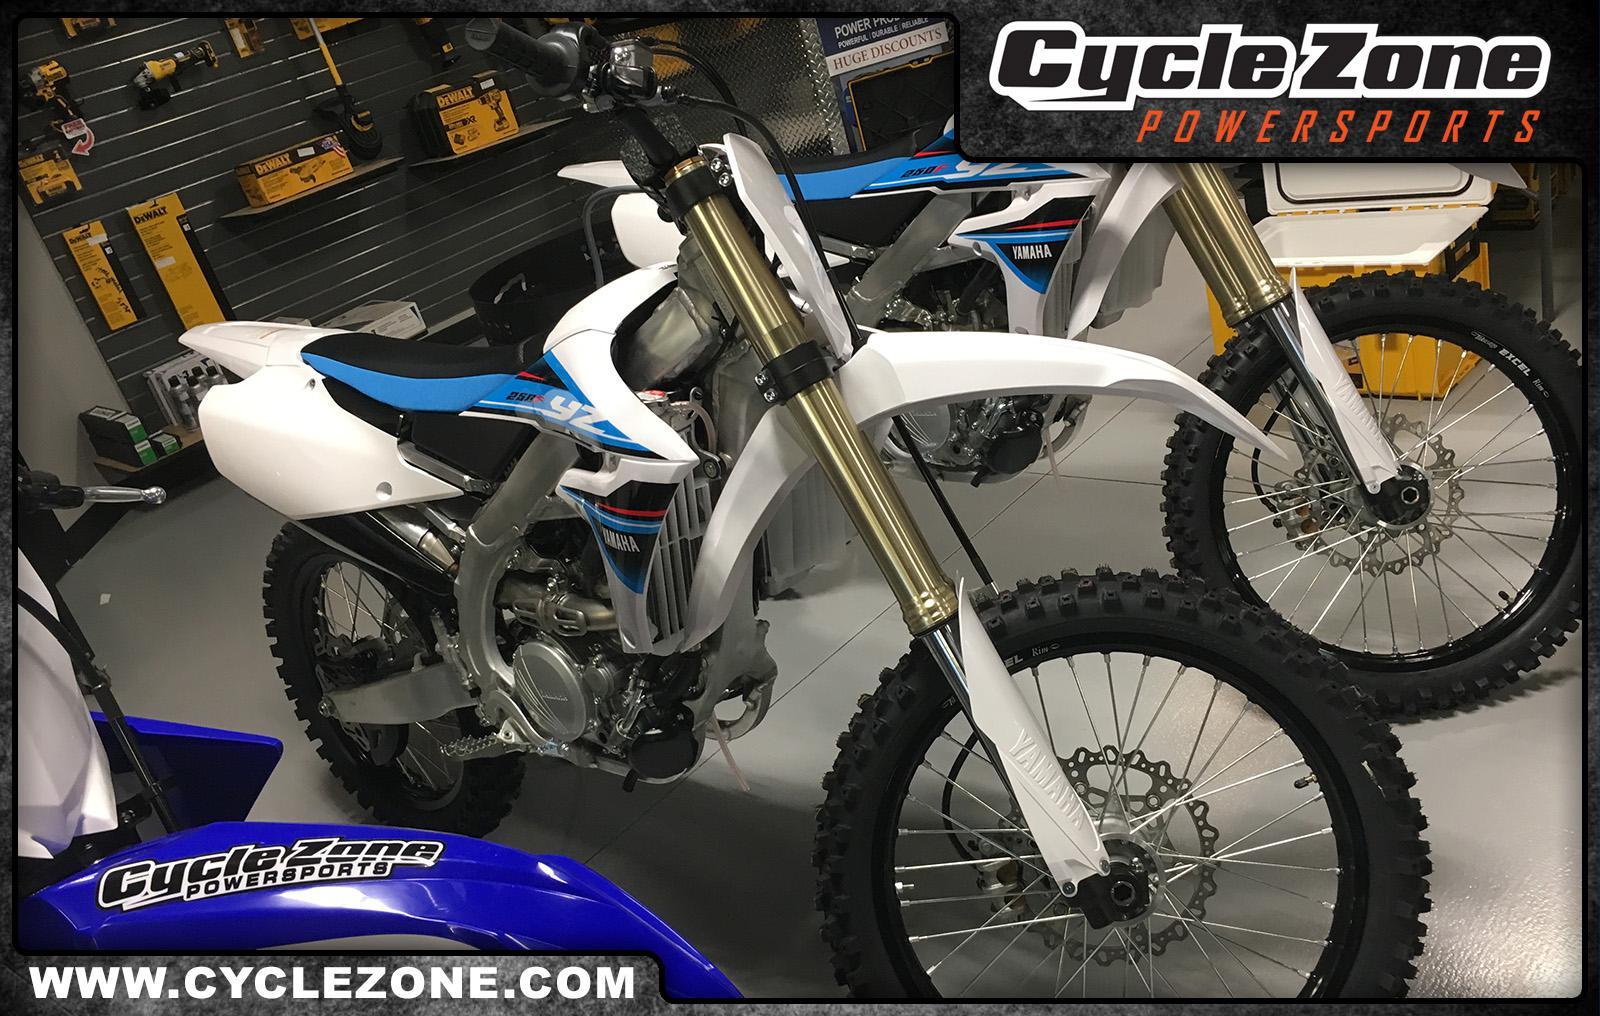 New Inventory from Yamaha Cycle Zone Powersports Topeka, KS